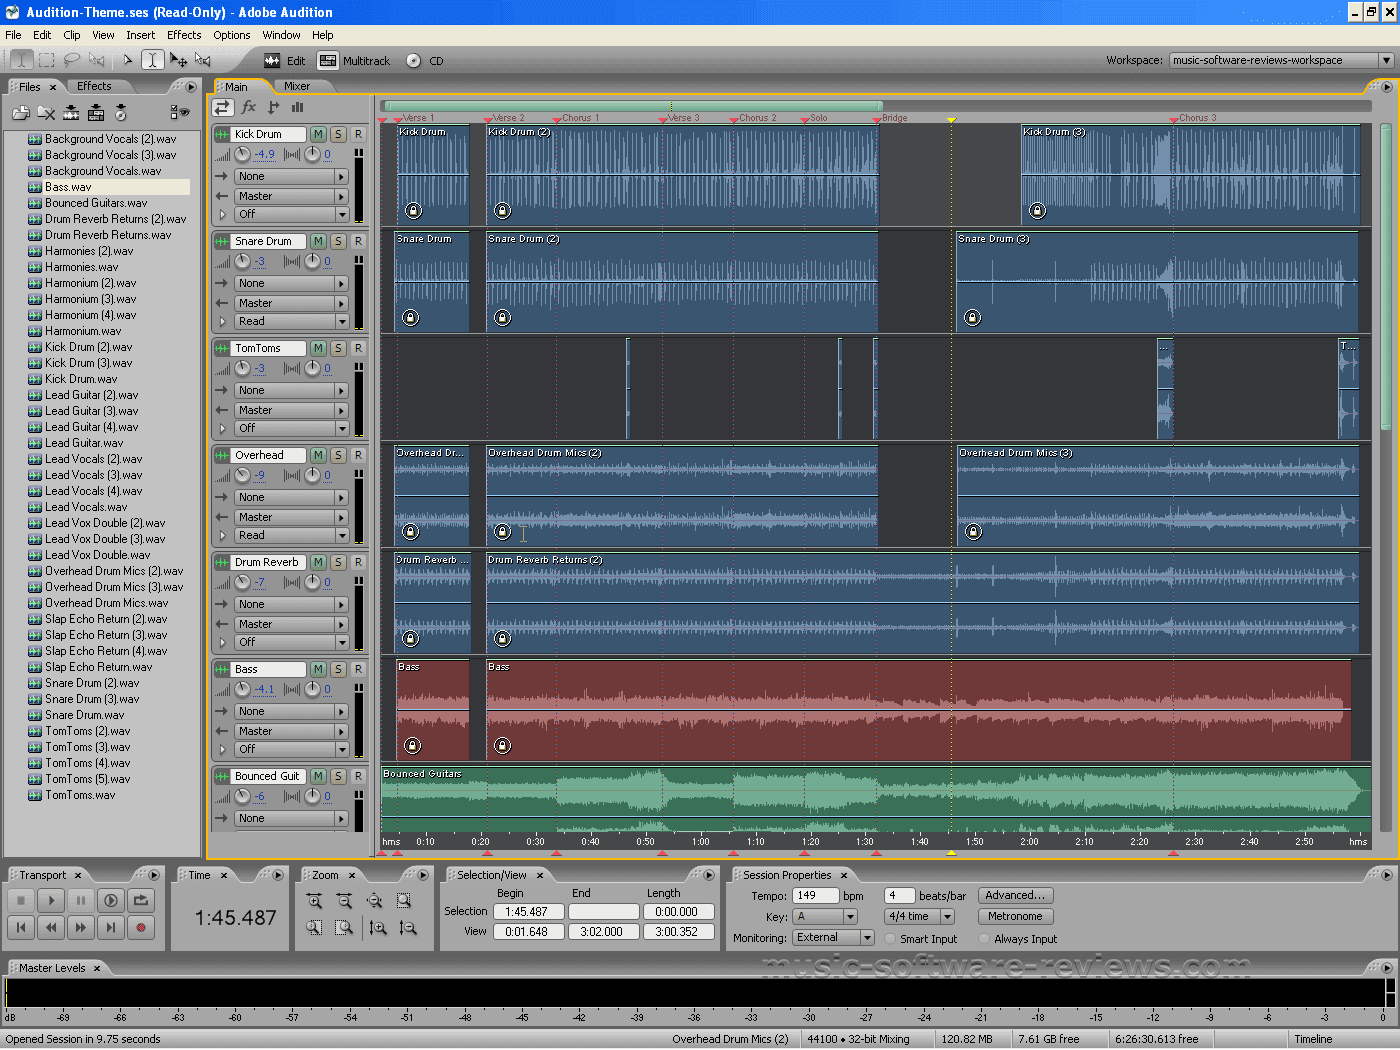 Adobe Audition Эффекты Звуки Эффекты Ааудиоэффекты